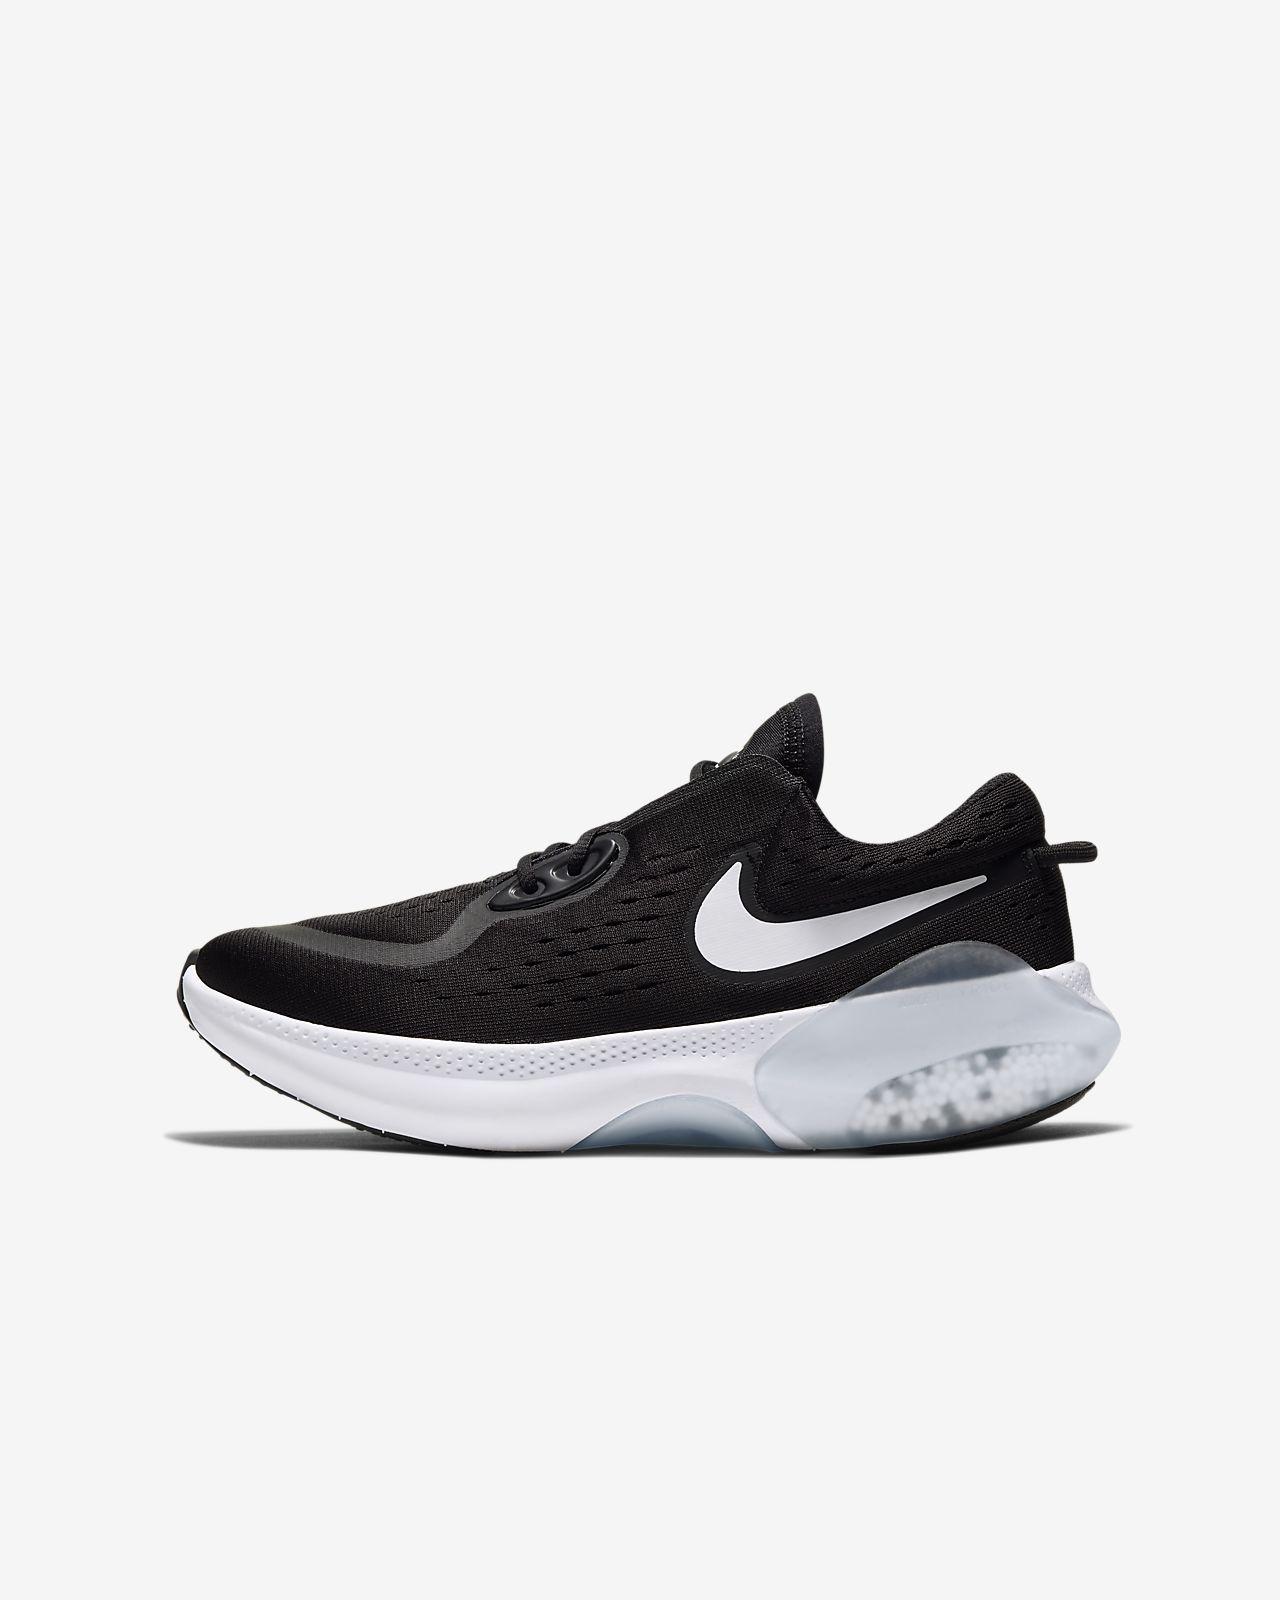 Nike Joyride Dual Run Zapatillas de running - Niño/a